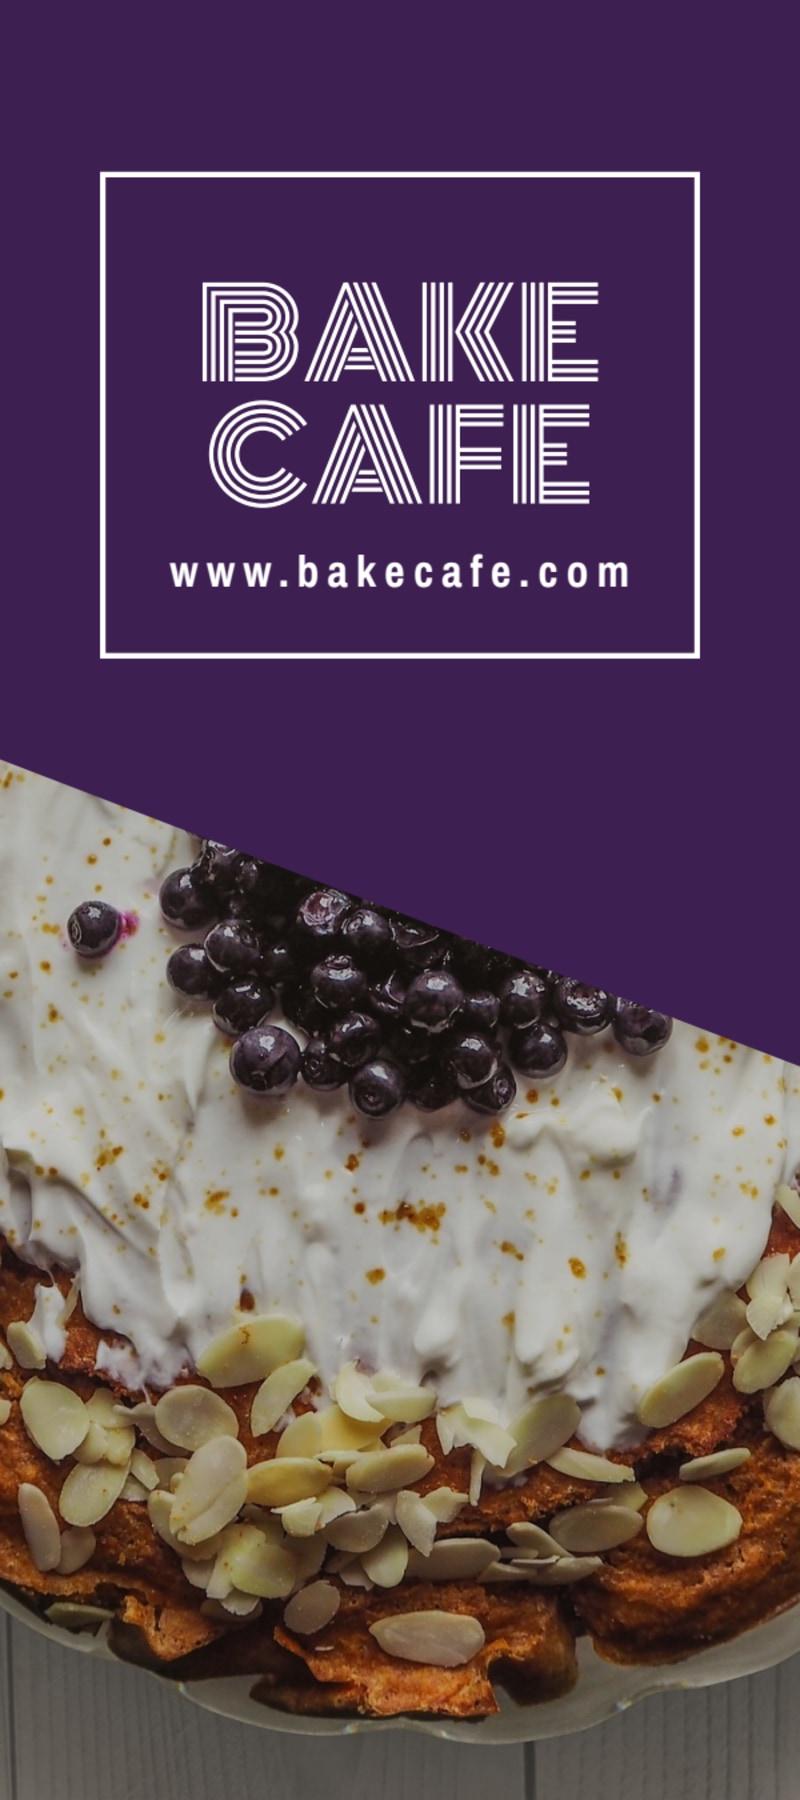 Dessert After Work Flyer Template Preview 3